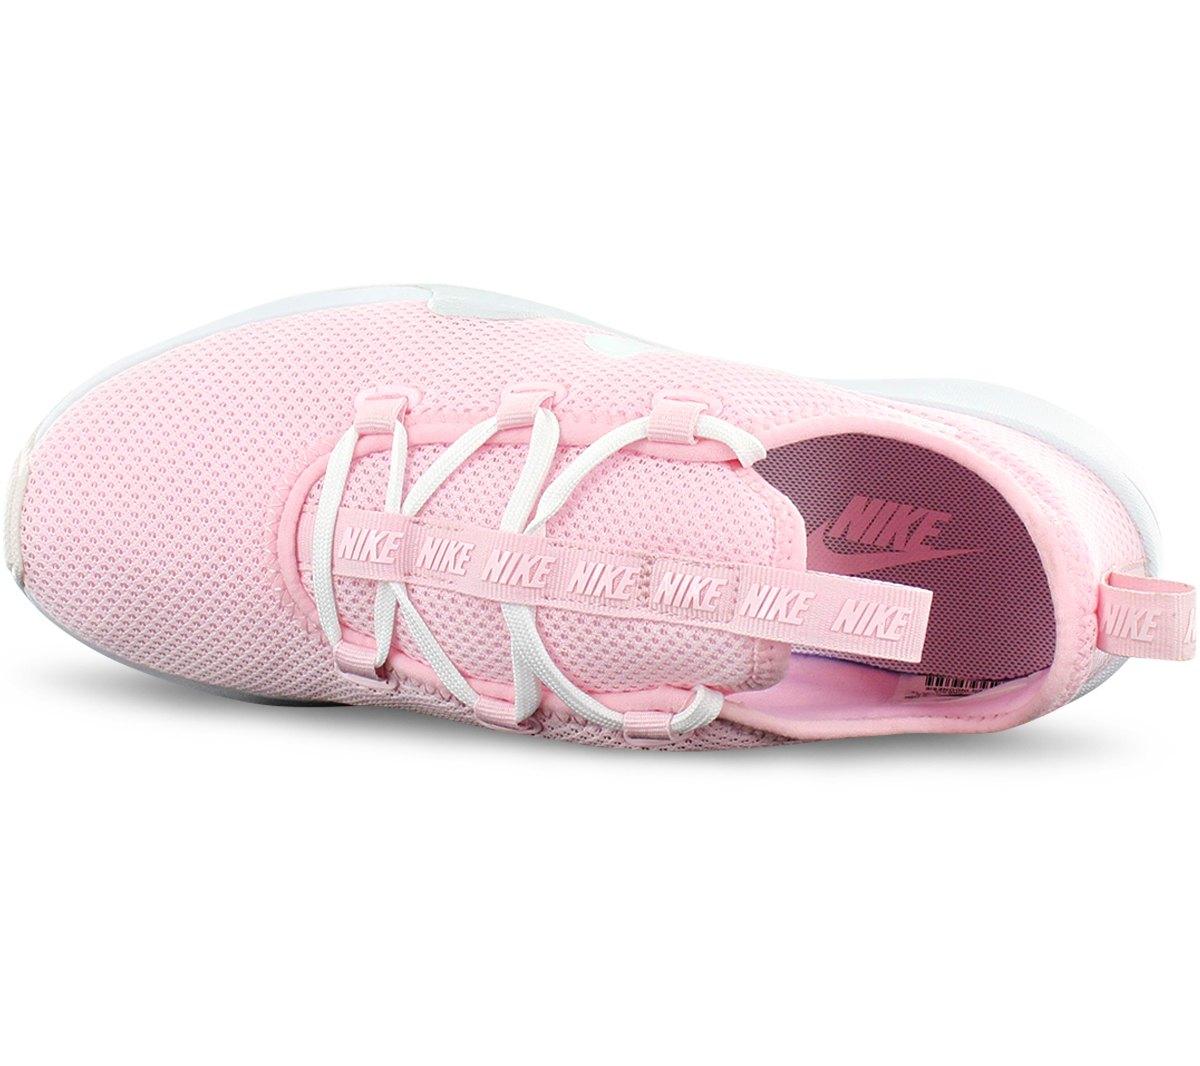 Nike Aschin Modern Damen Sneaker AJ8799603 Rosa Fitness Sport Schuhe Turnschuhe